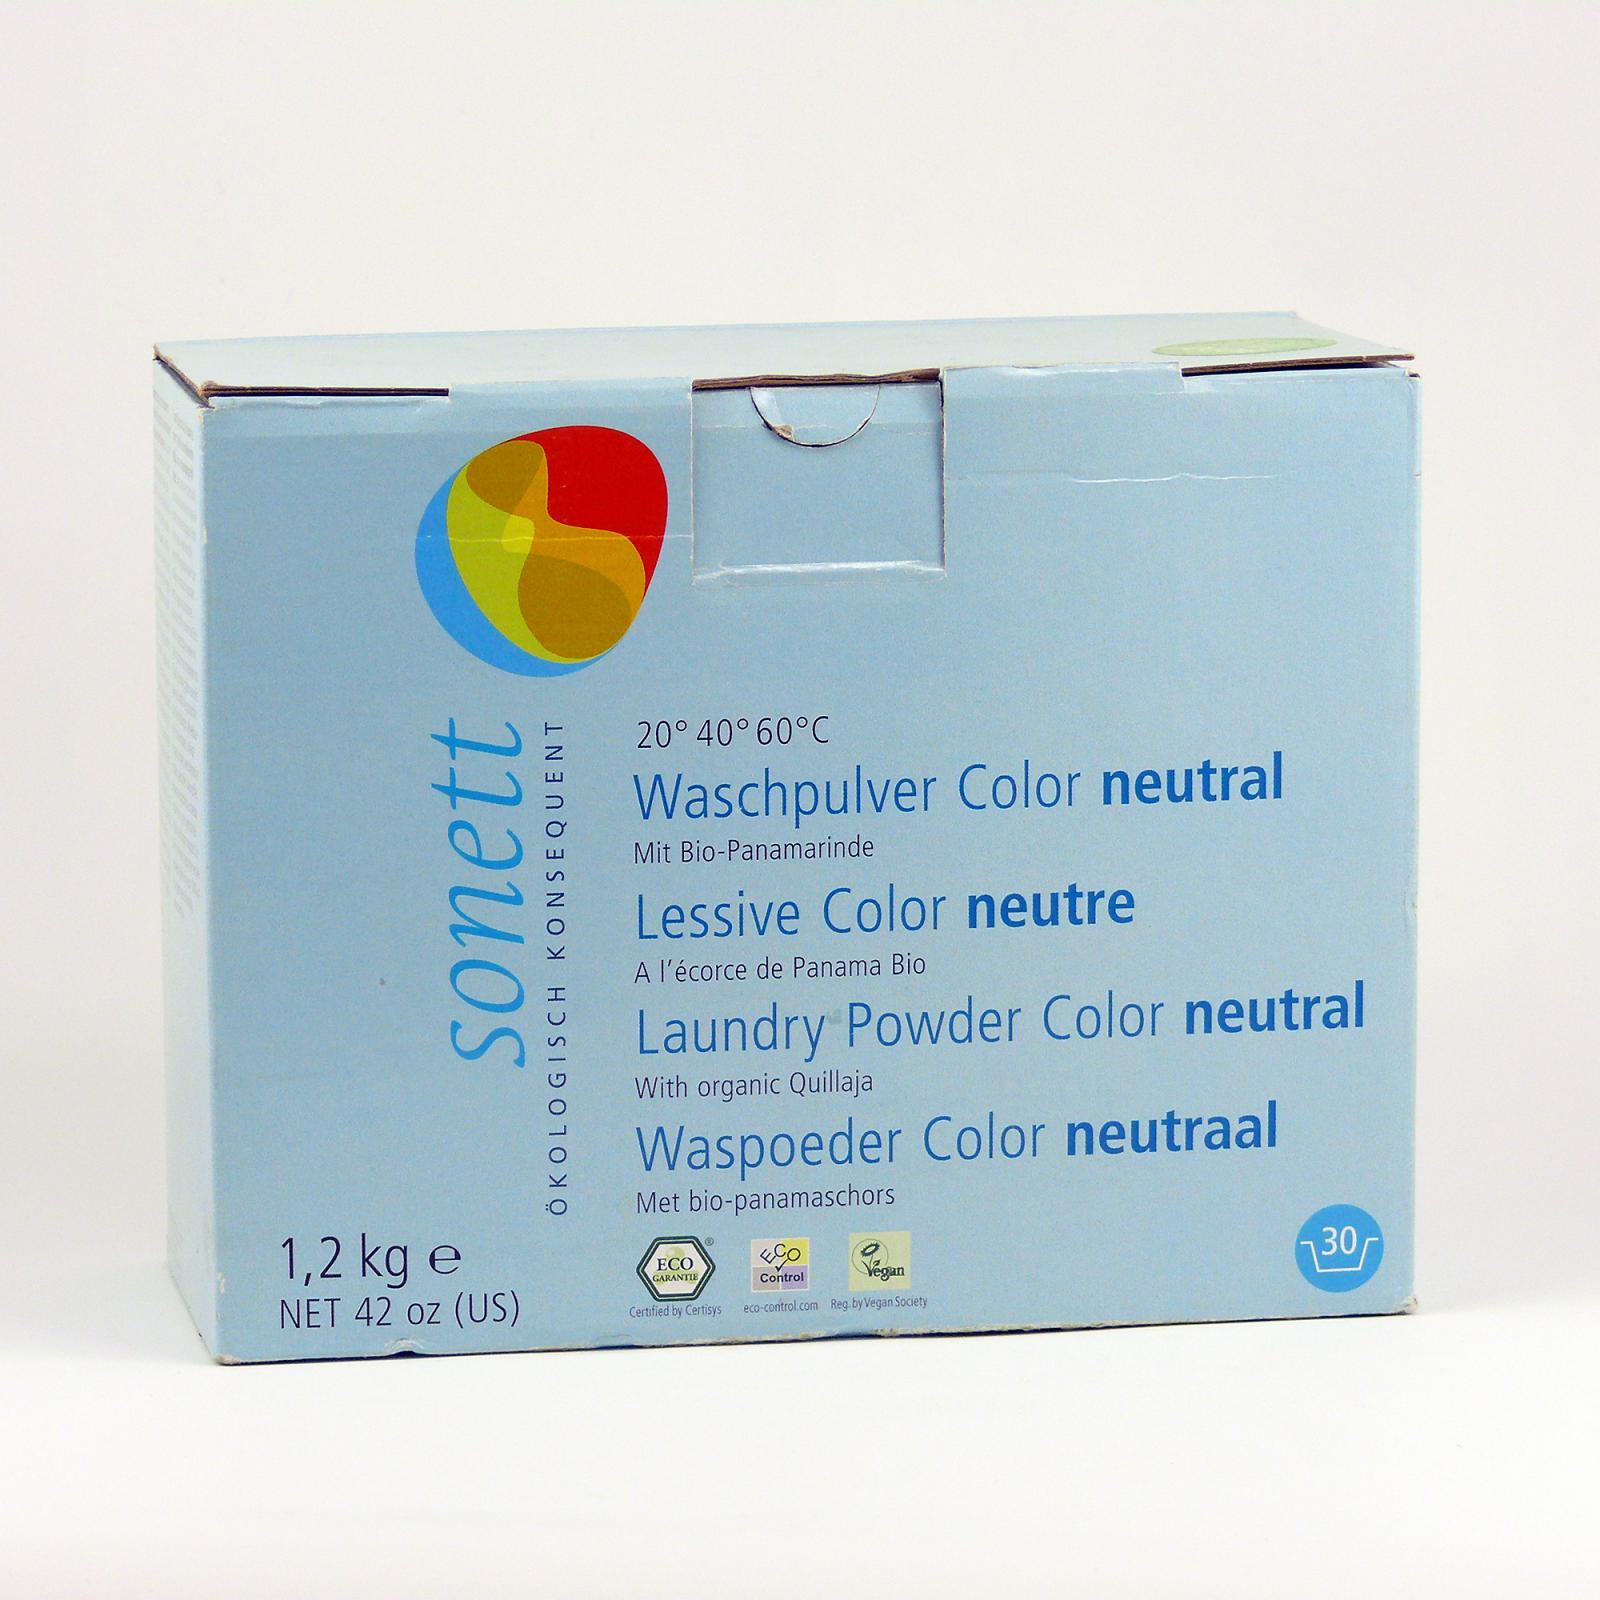 Sonett Prášek na praní Neutral 1,2 kg